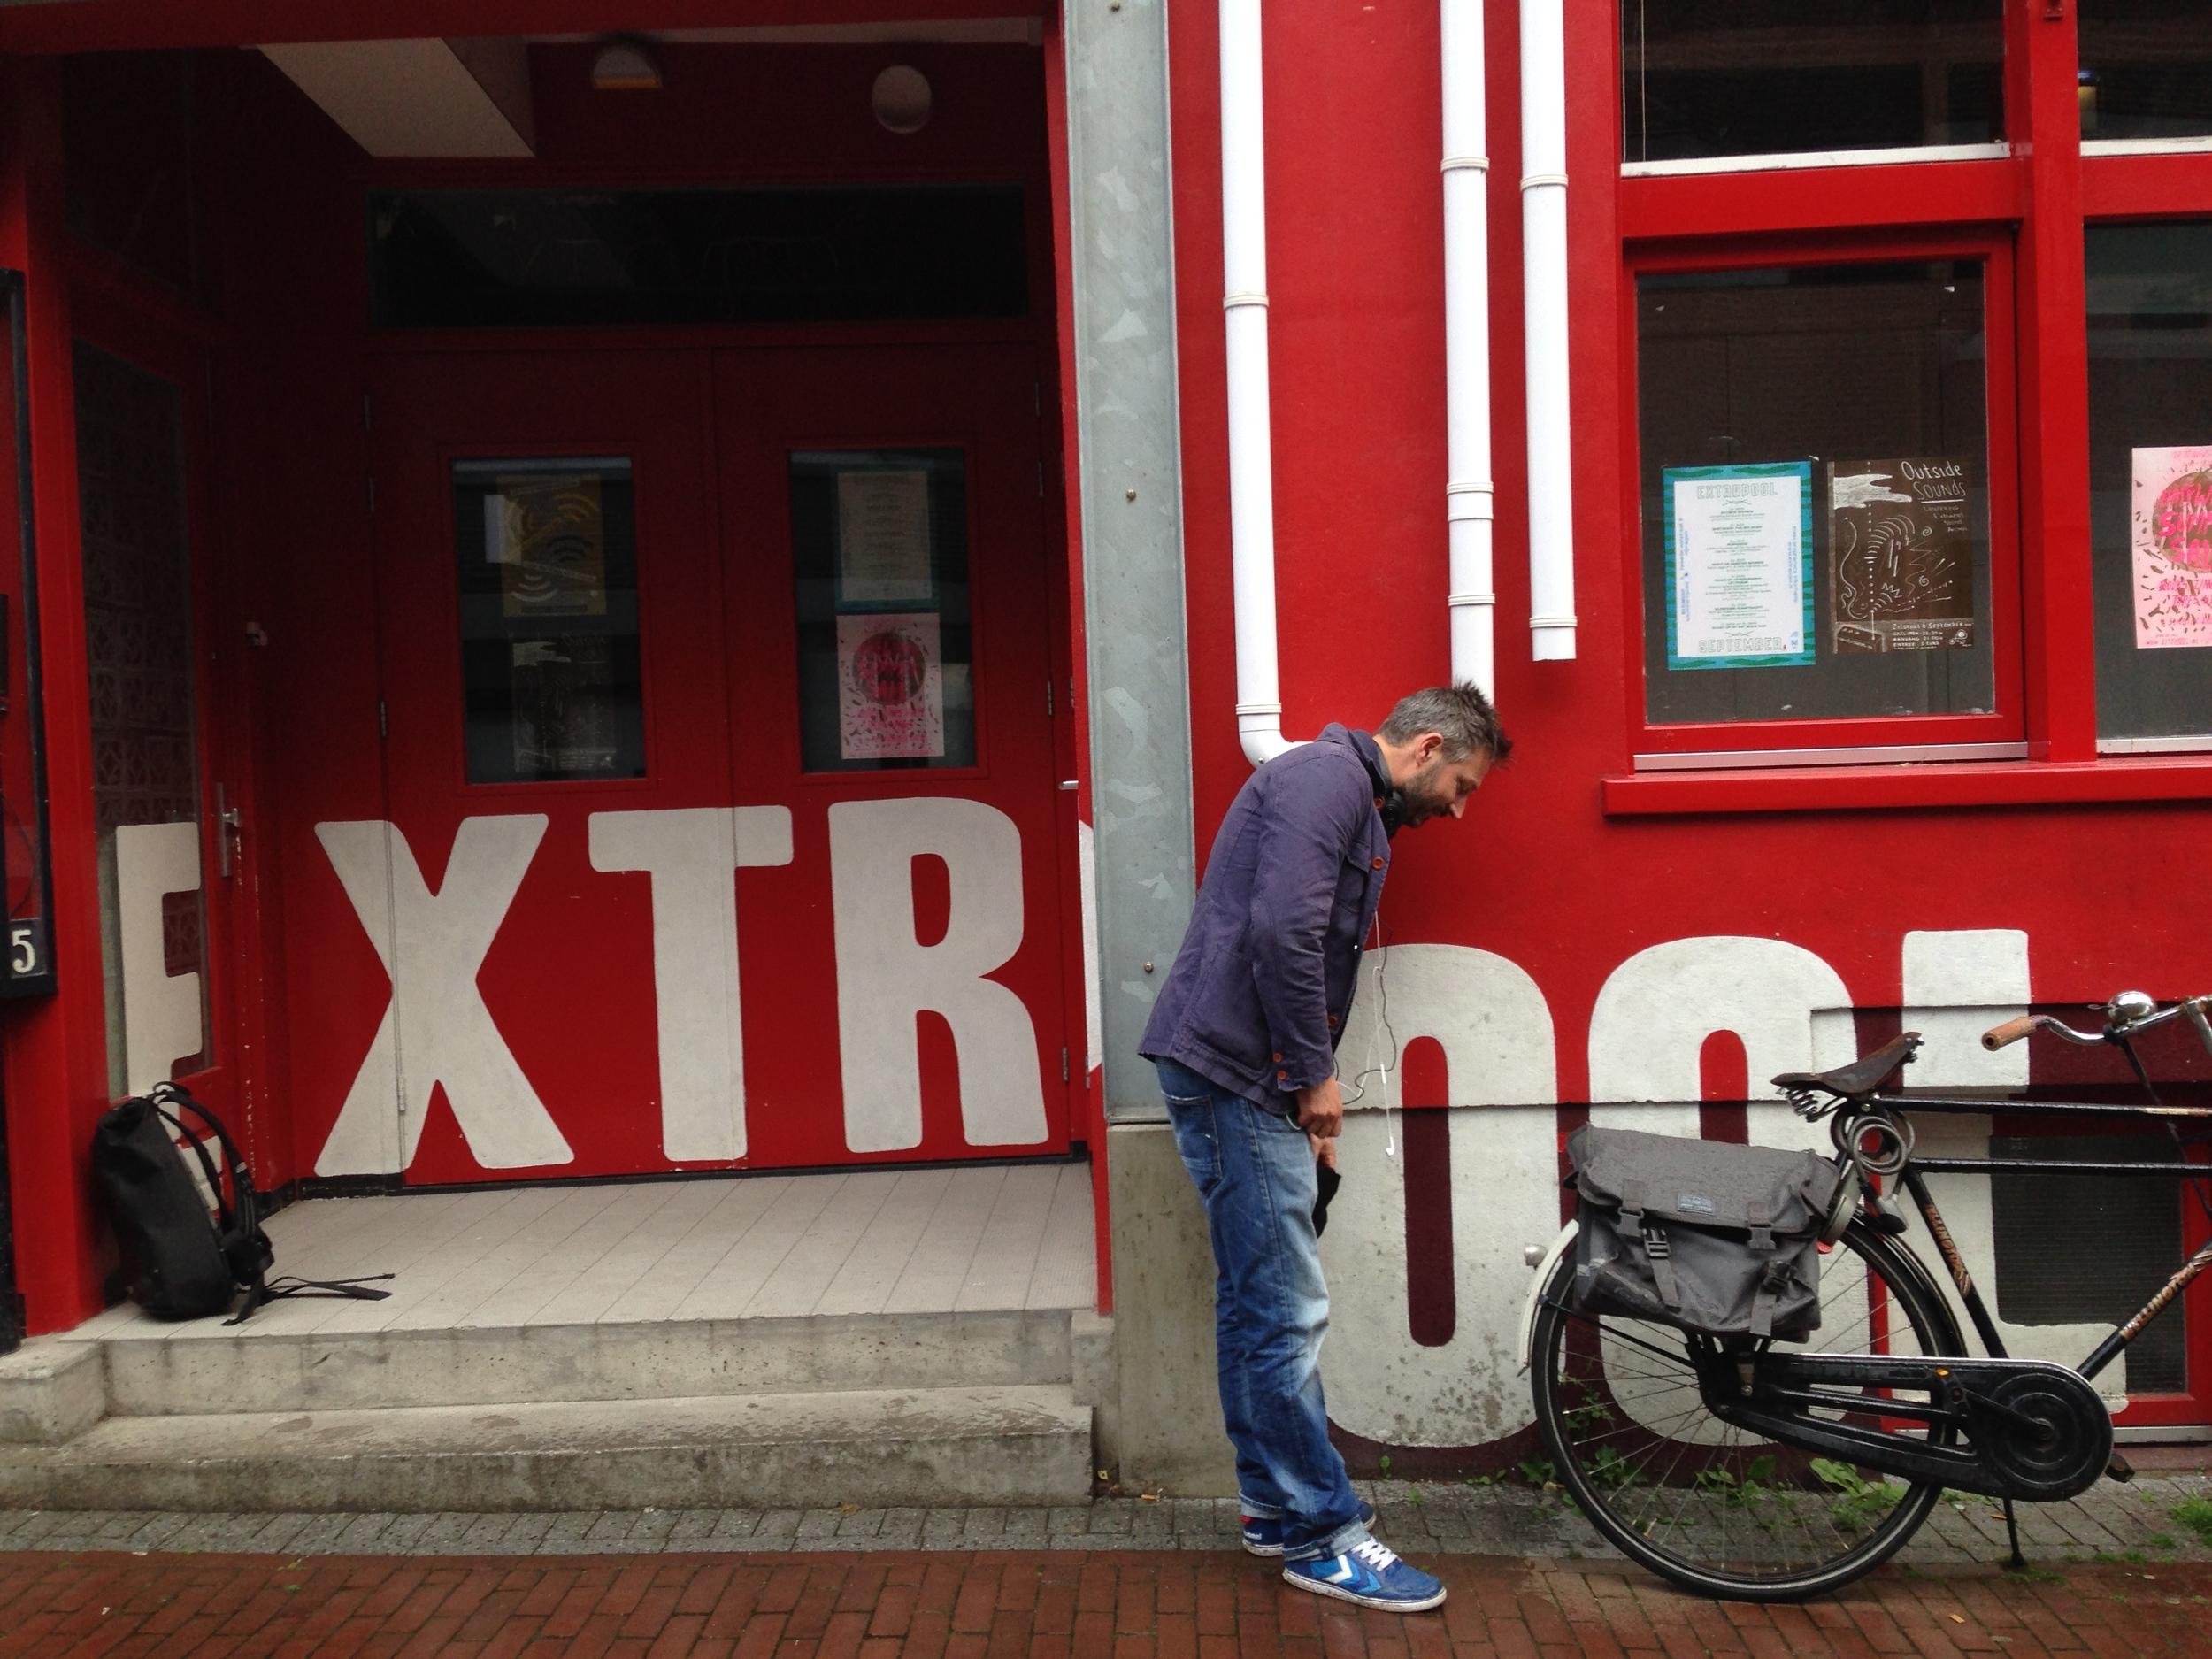 Location: Extrapool andValkhofpark, Nijmegen, NL